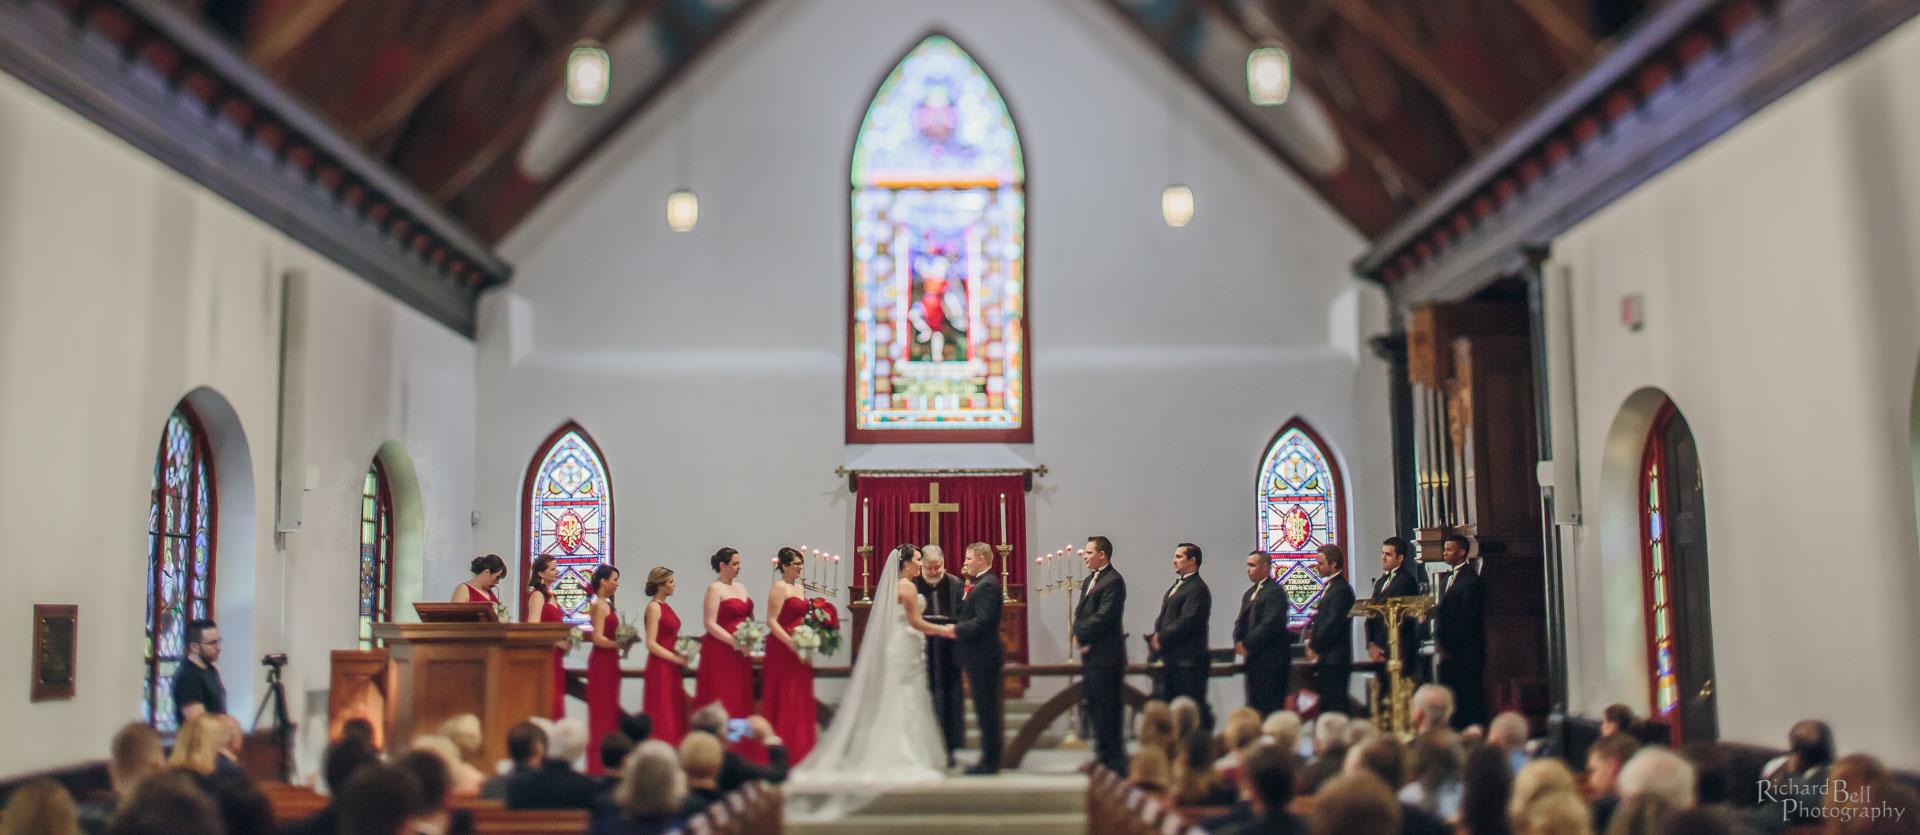 Ceremony Photo at St Lukes Chapel Andrea and Josh